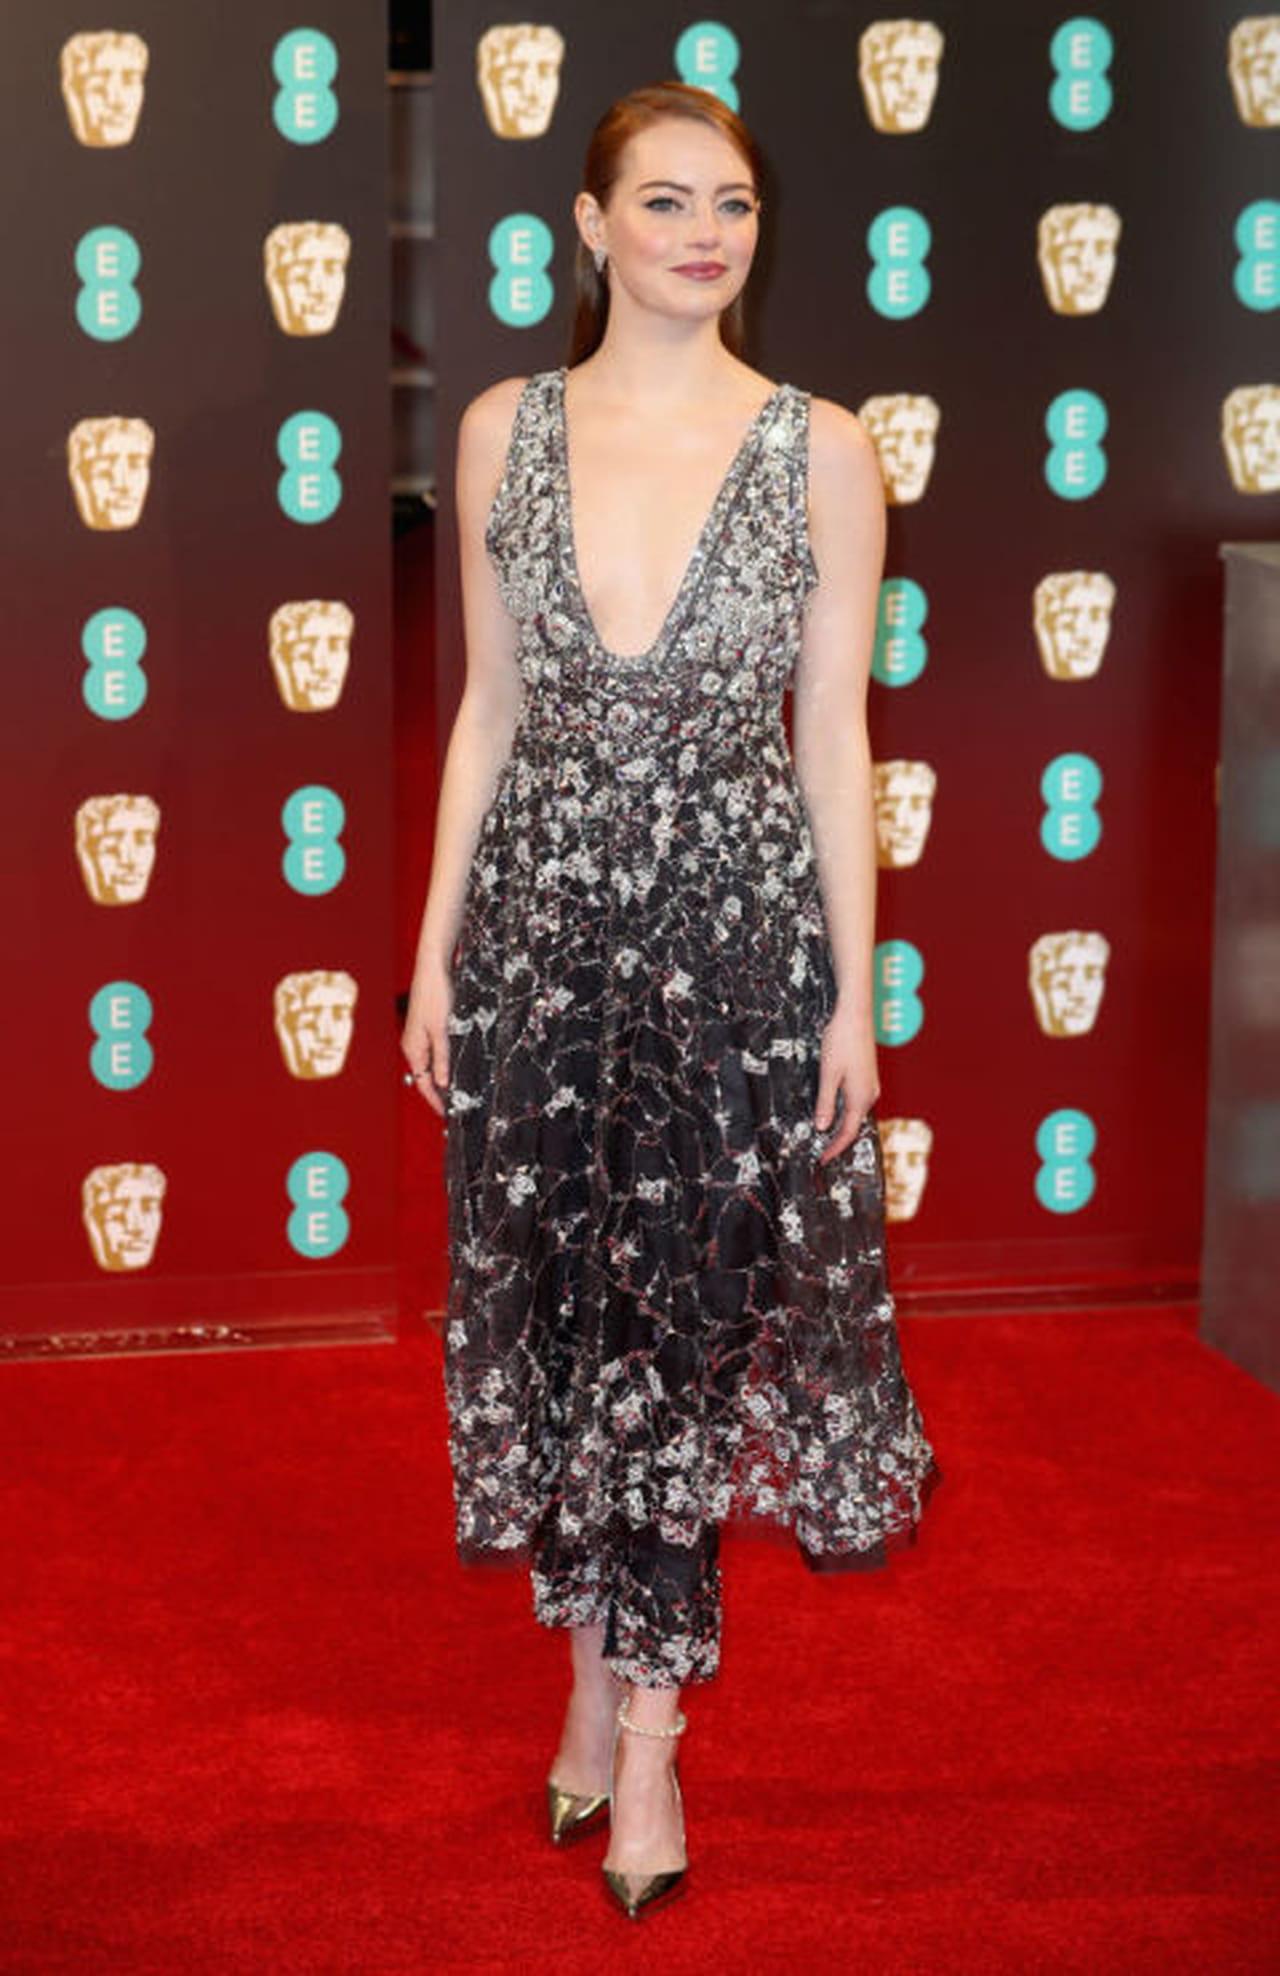 37d999884e5c6 النجمة إيما ستون ترتدي فستان أنيق بتطريزات الورود مع سروال خاص بالفستان من  توقيع شانيل Chanel.